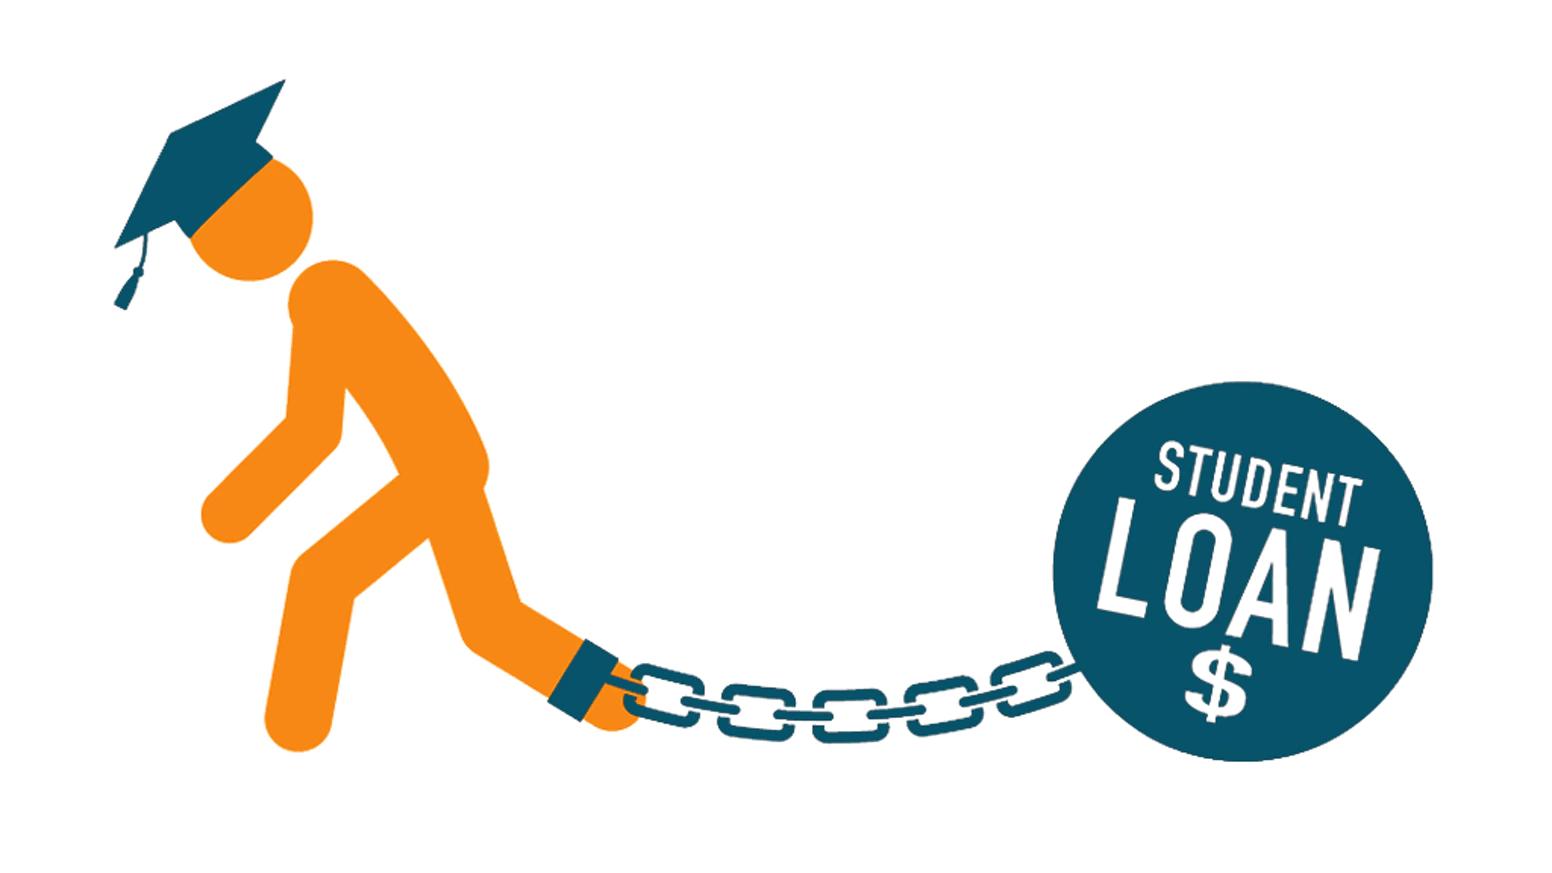 Public Service Loan Forgiveness Program Fails to Forgive